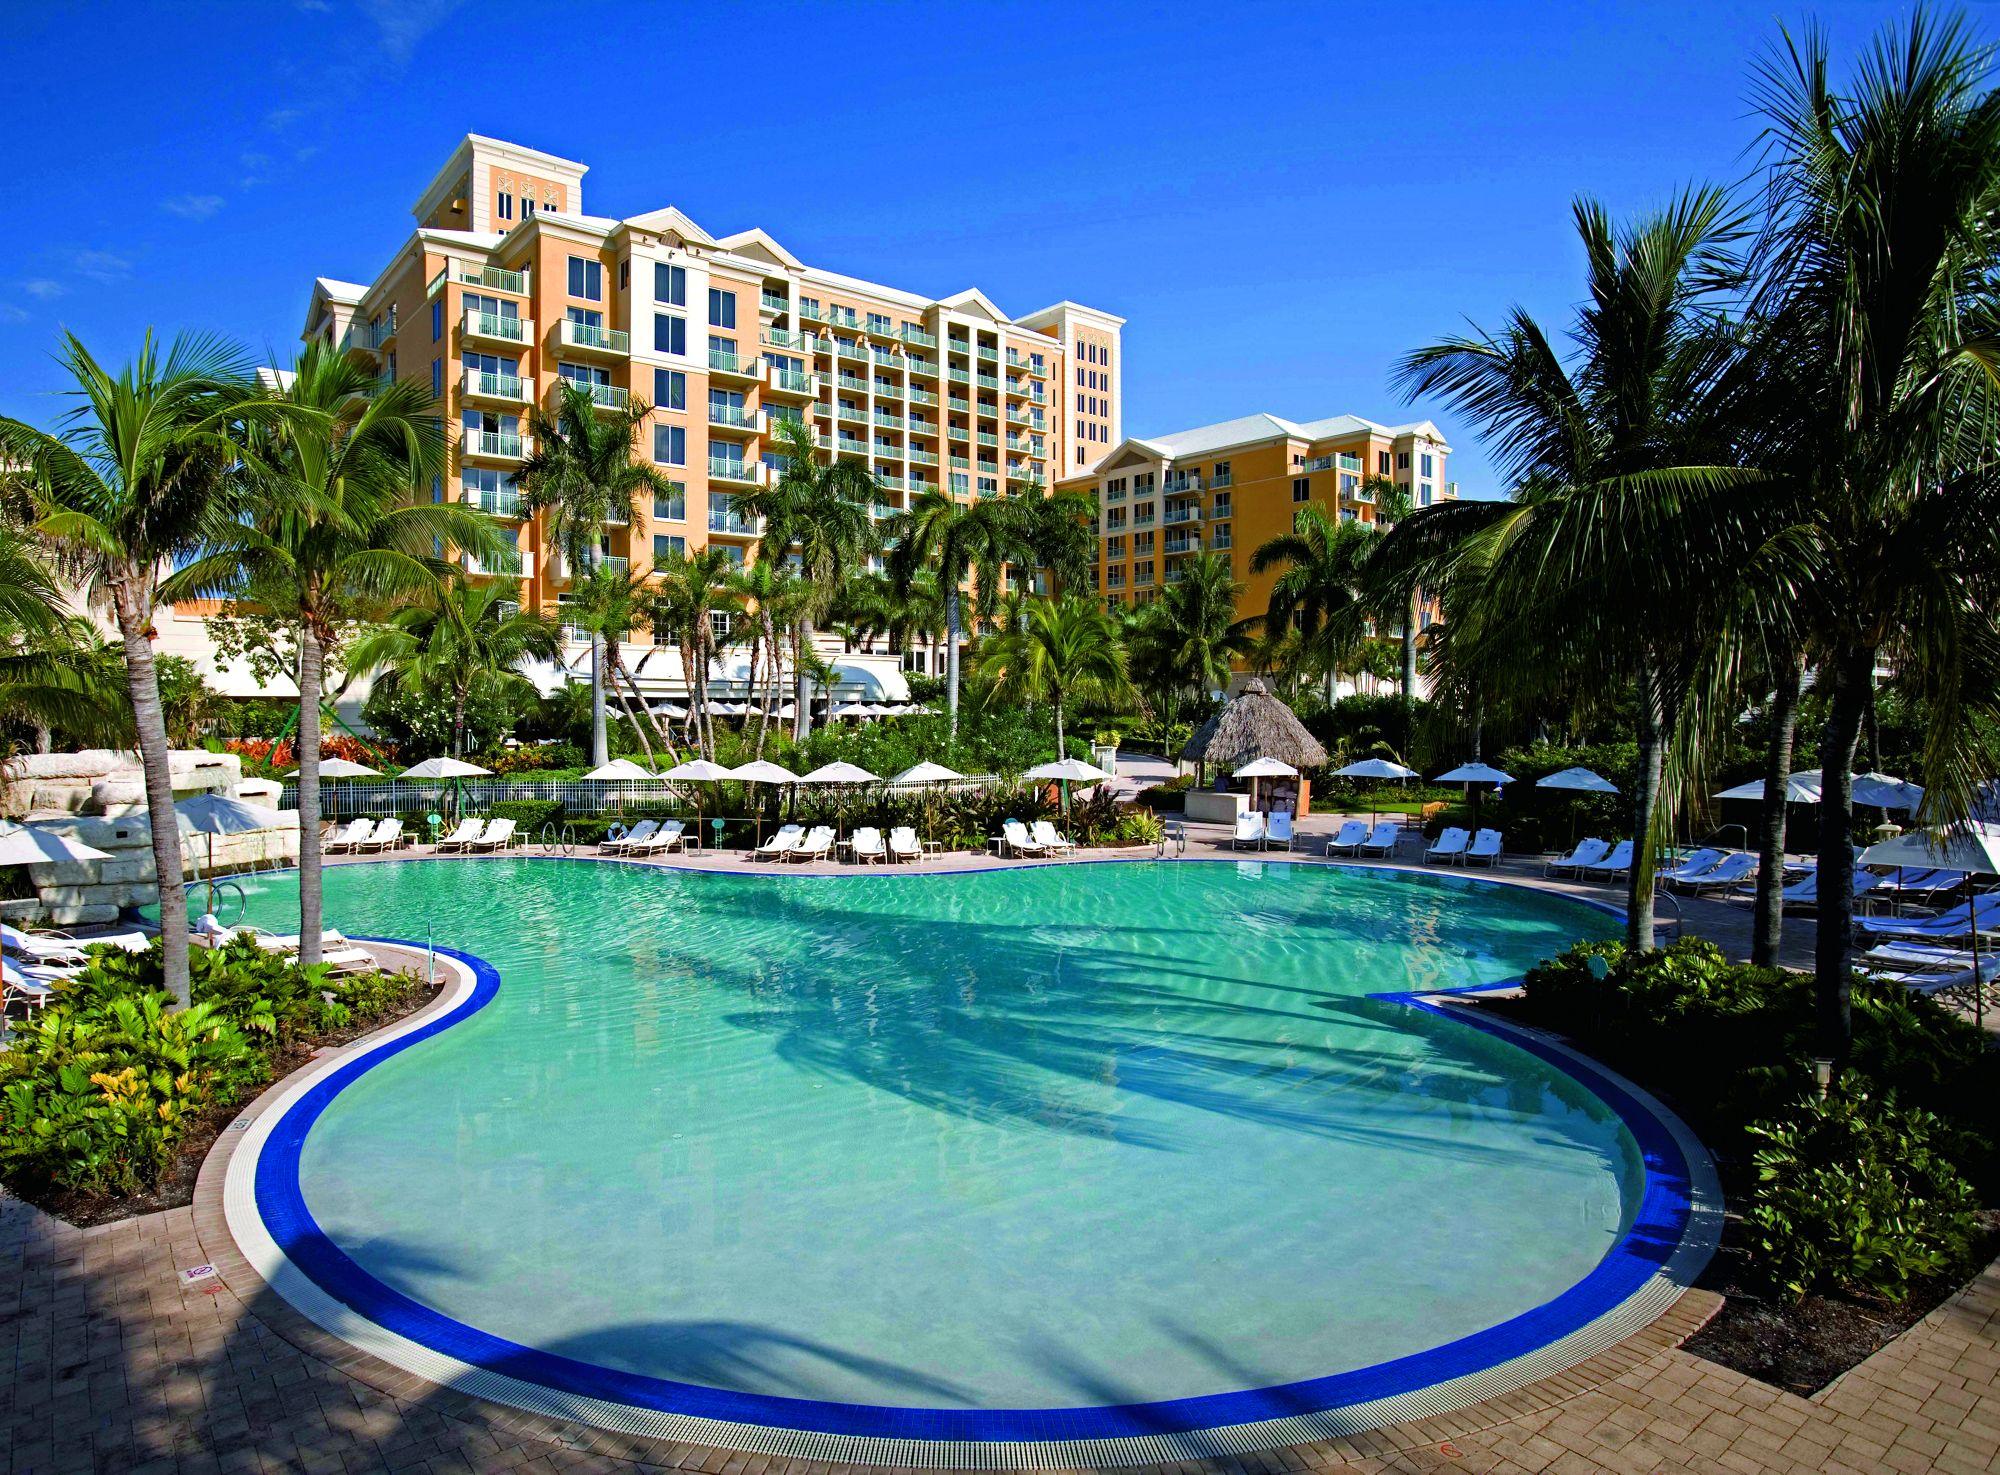 Ritz-Carlton Key Biscayne